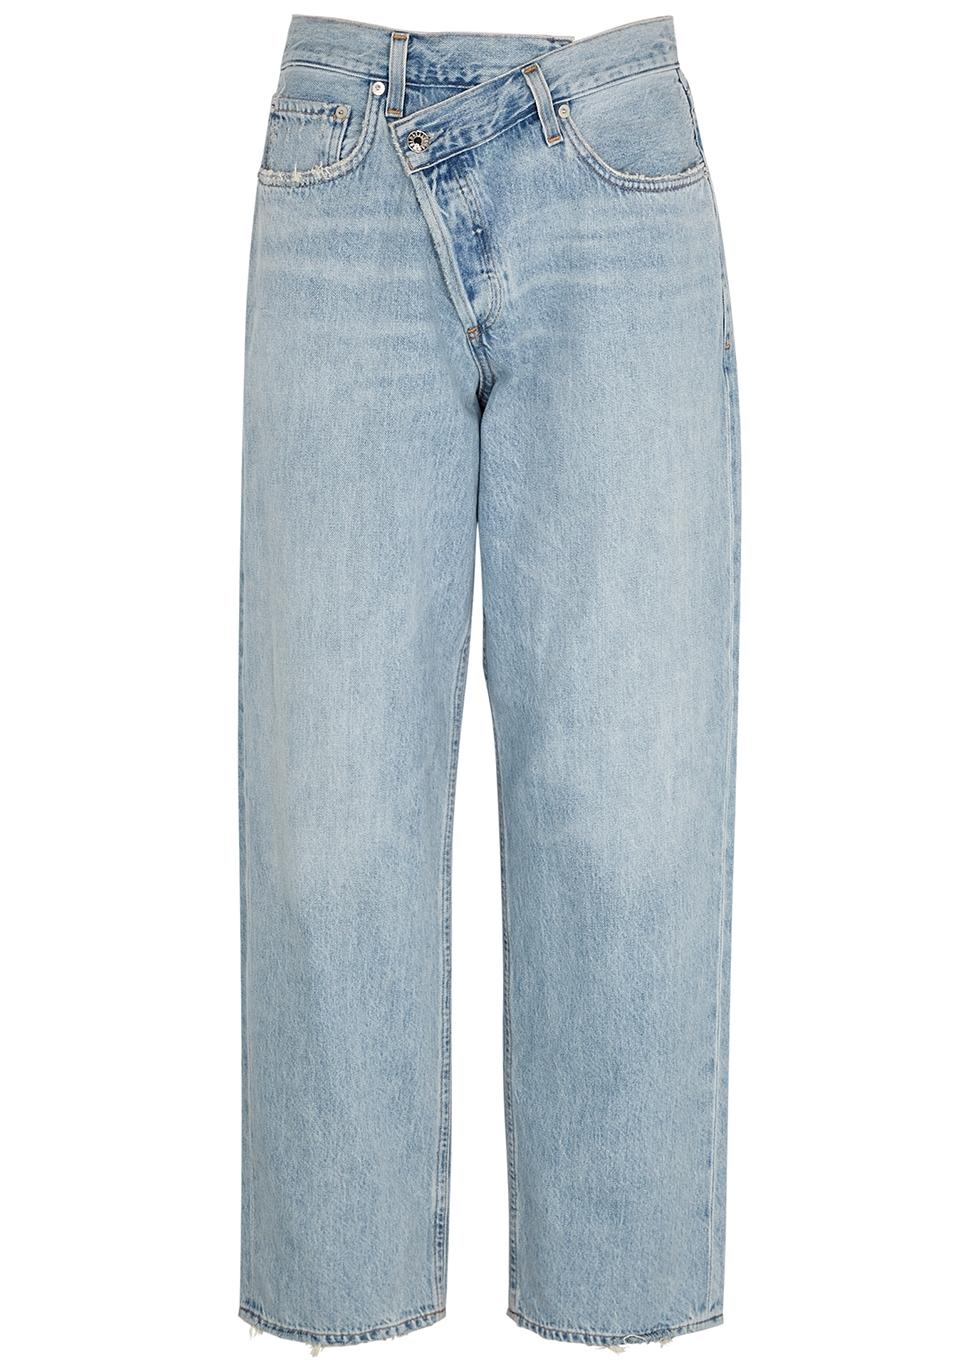 Criss Cross light blue straight-leg jeans